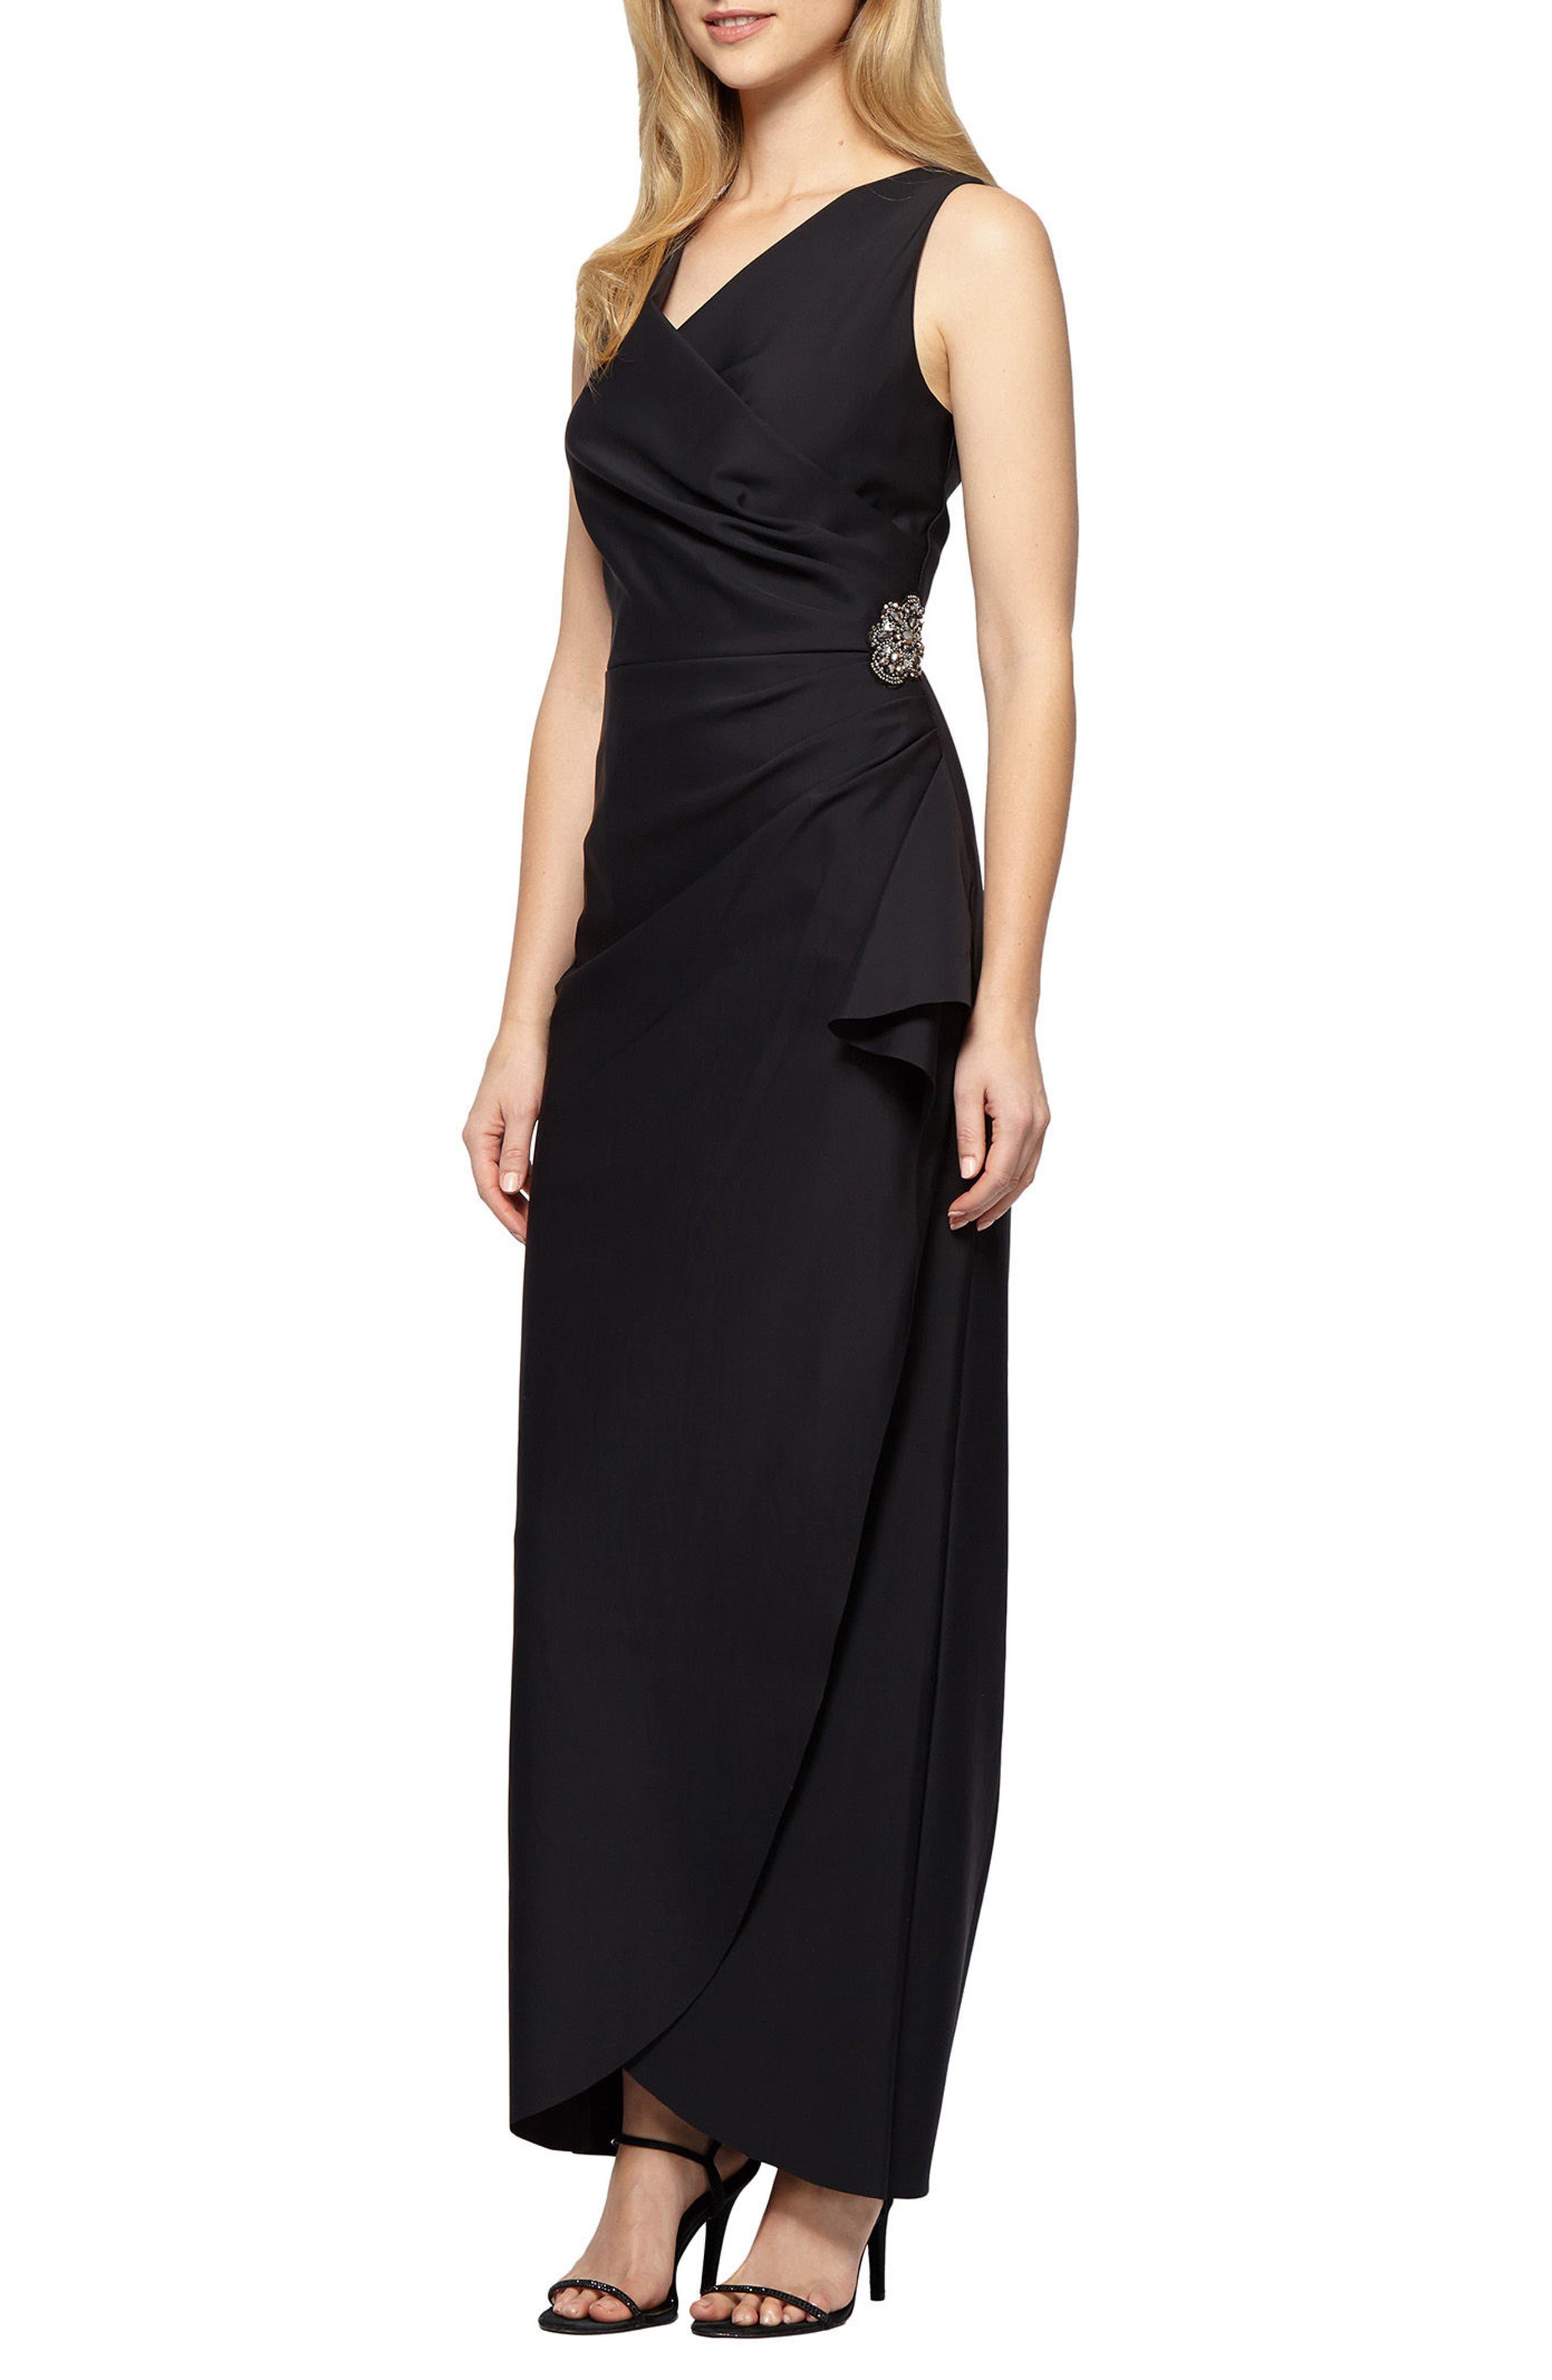 Alternate Image 1 Selected - Alex Evenings Embellished Side Drape Column Gown (Regular & Petite)